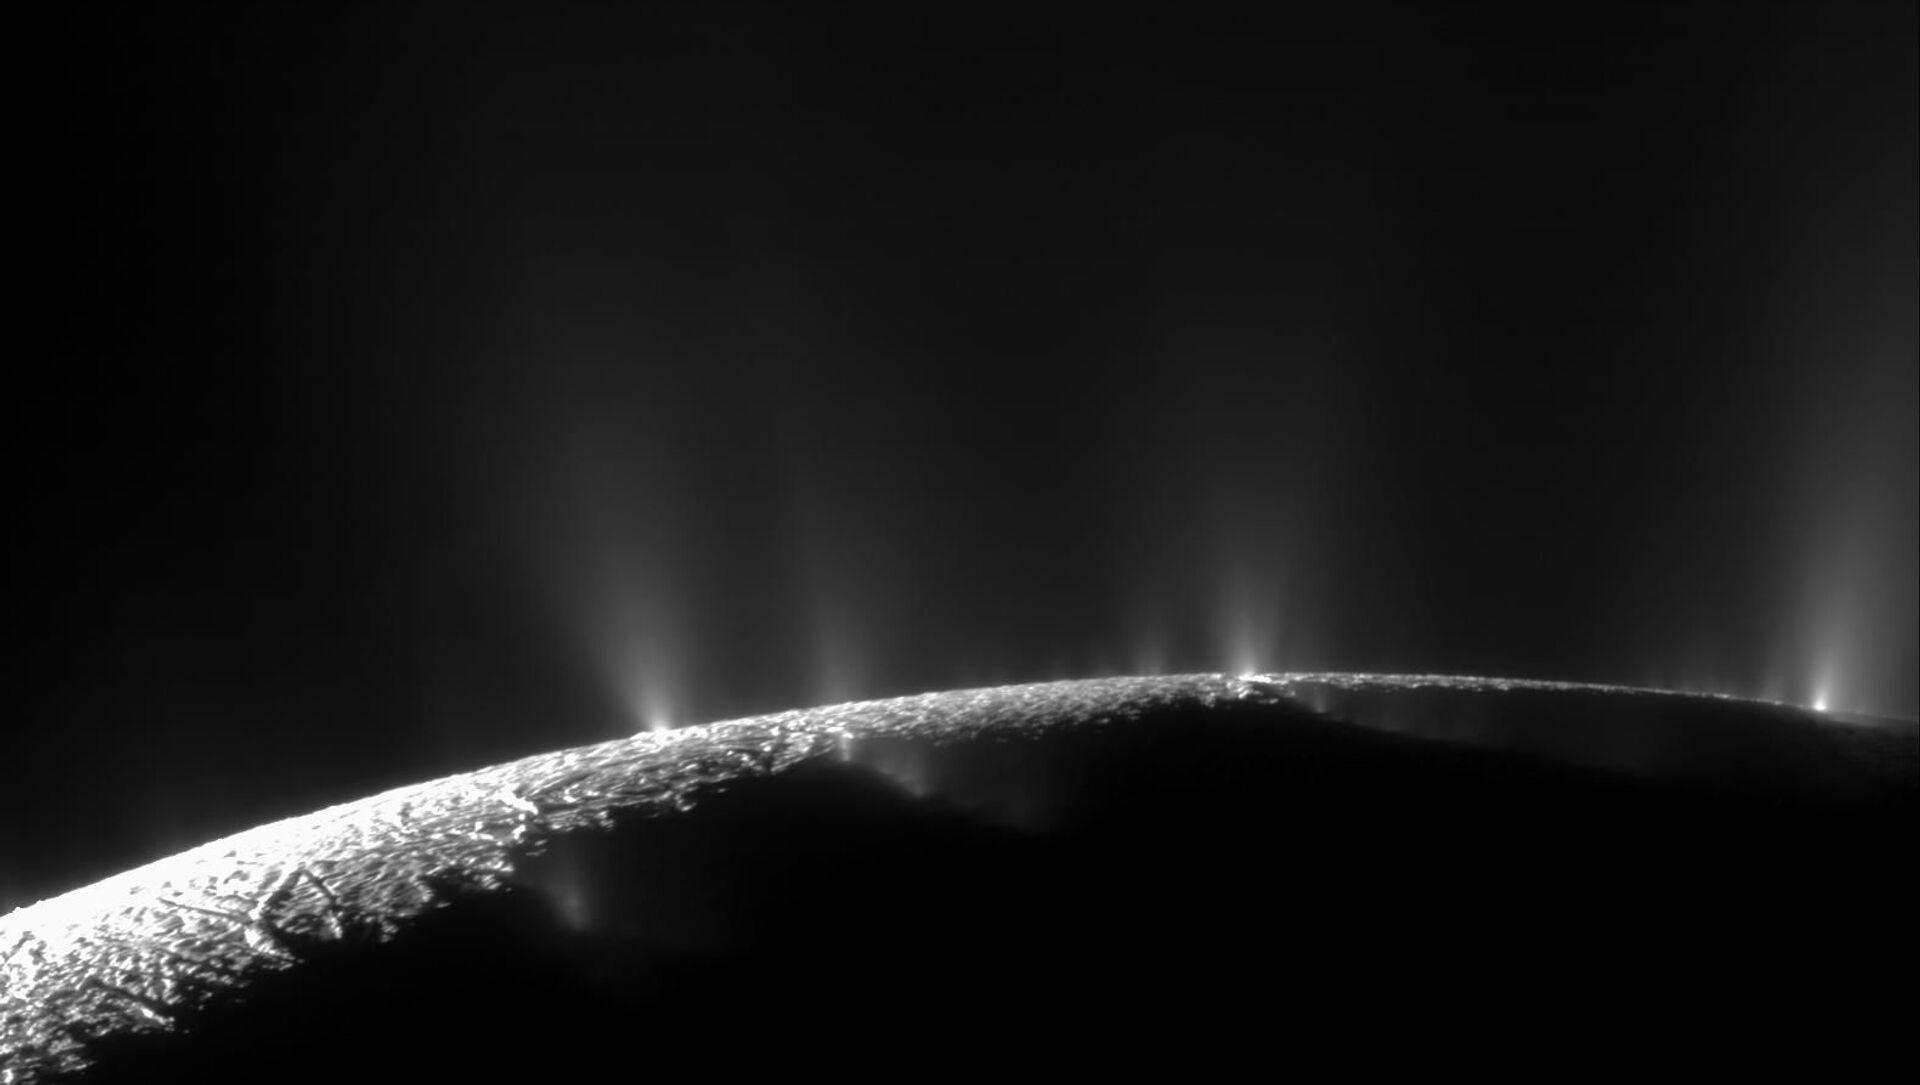 Enceladus - Sputnik Česká republika, 1920, 26.03.2021